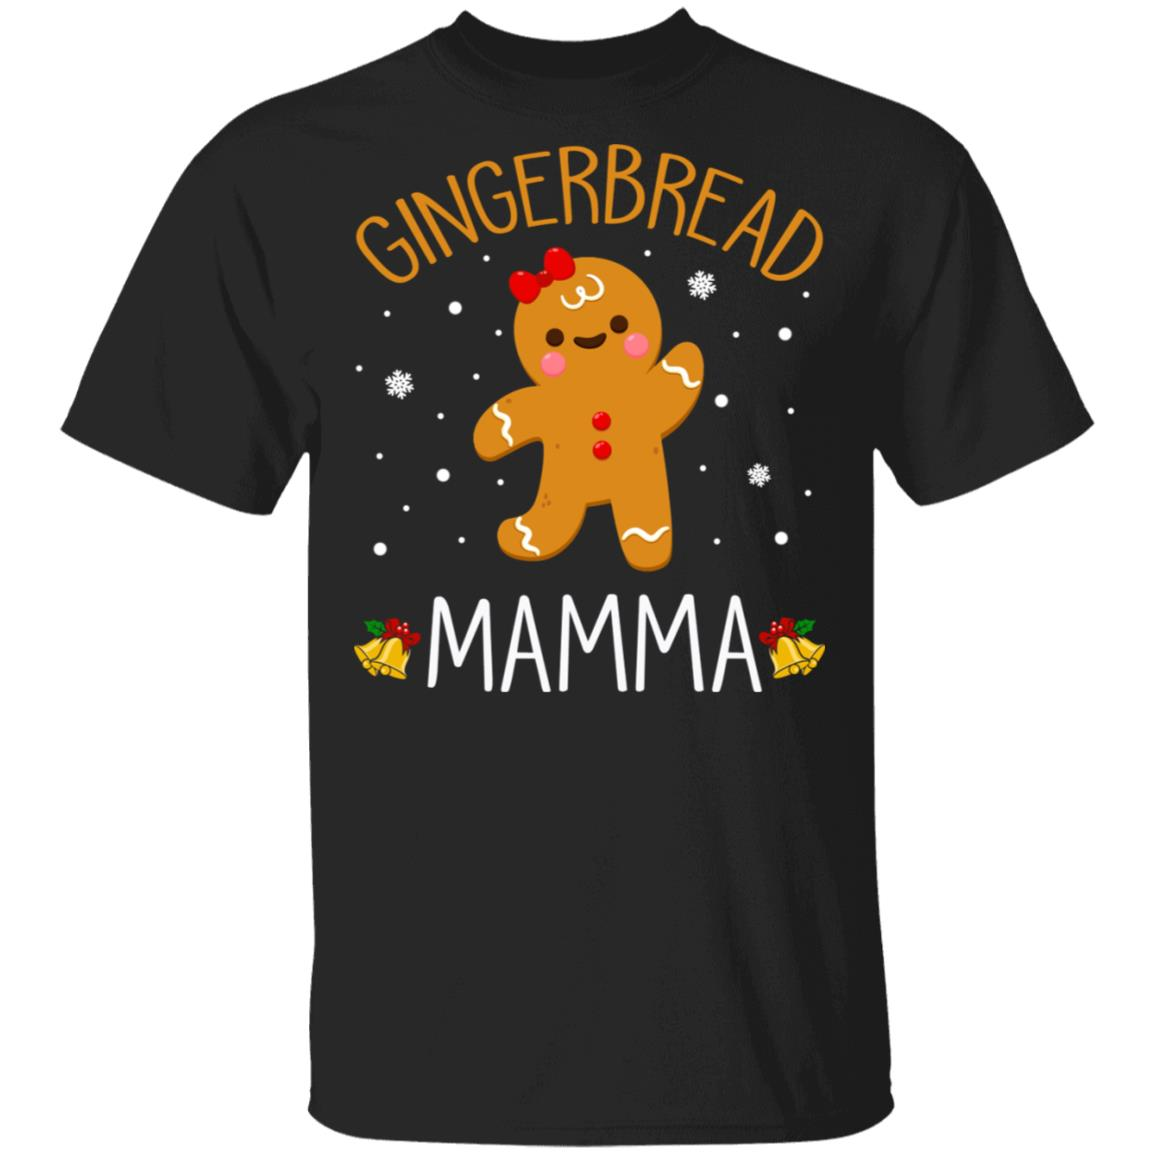 Xmas Cute Gingerbread Men Mamma Christmas Family Unisex Short Sleeve